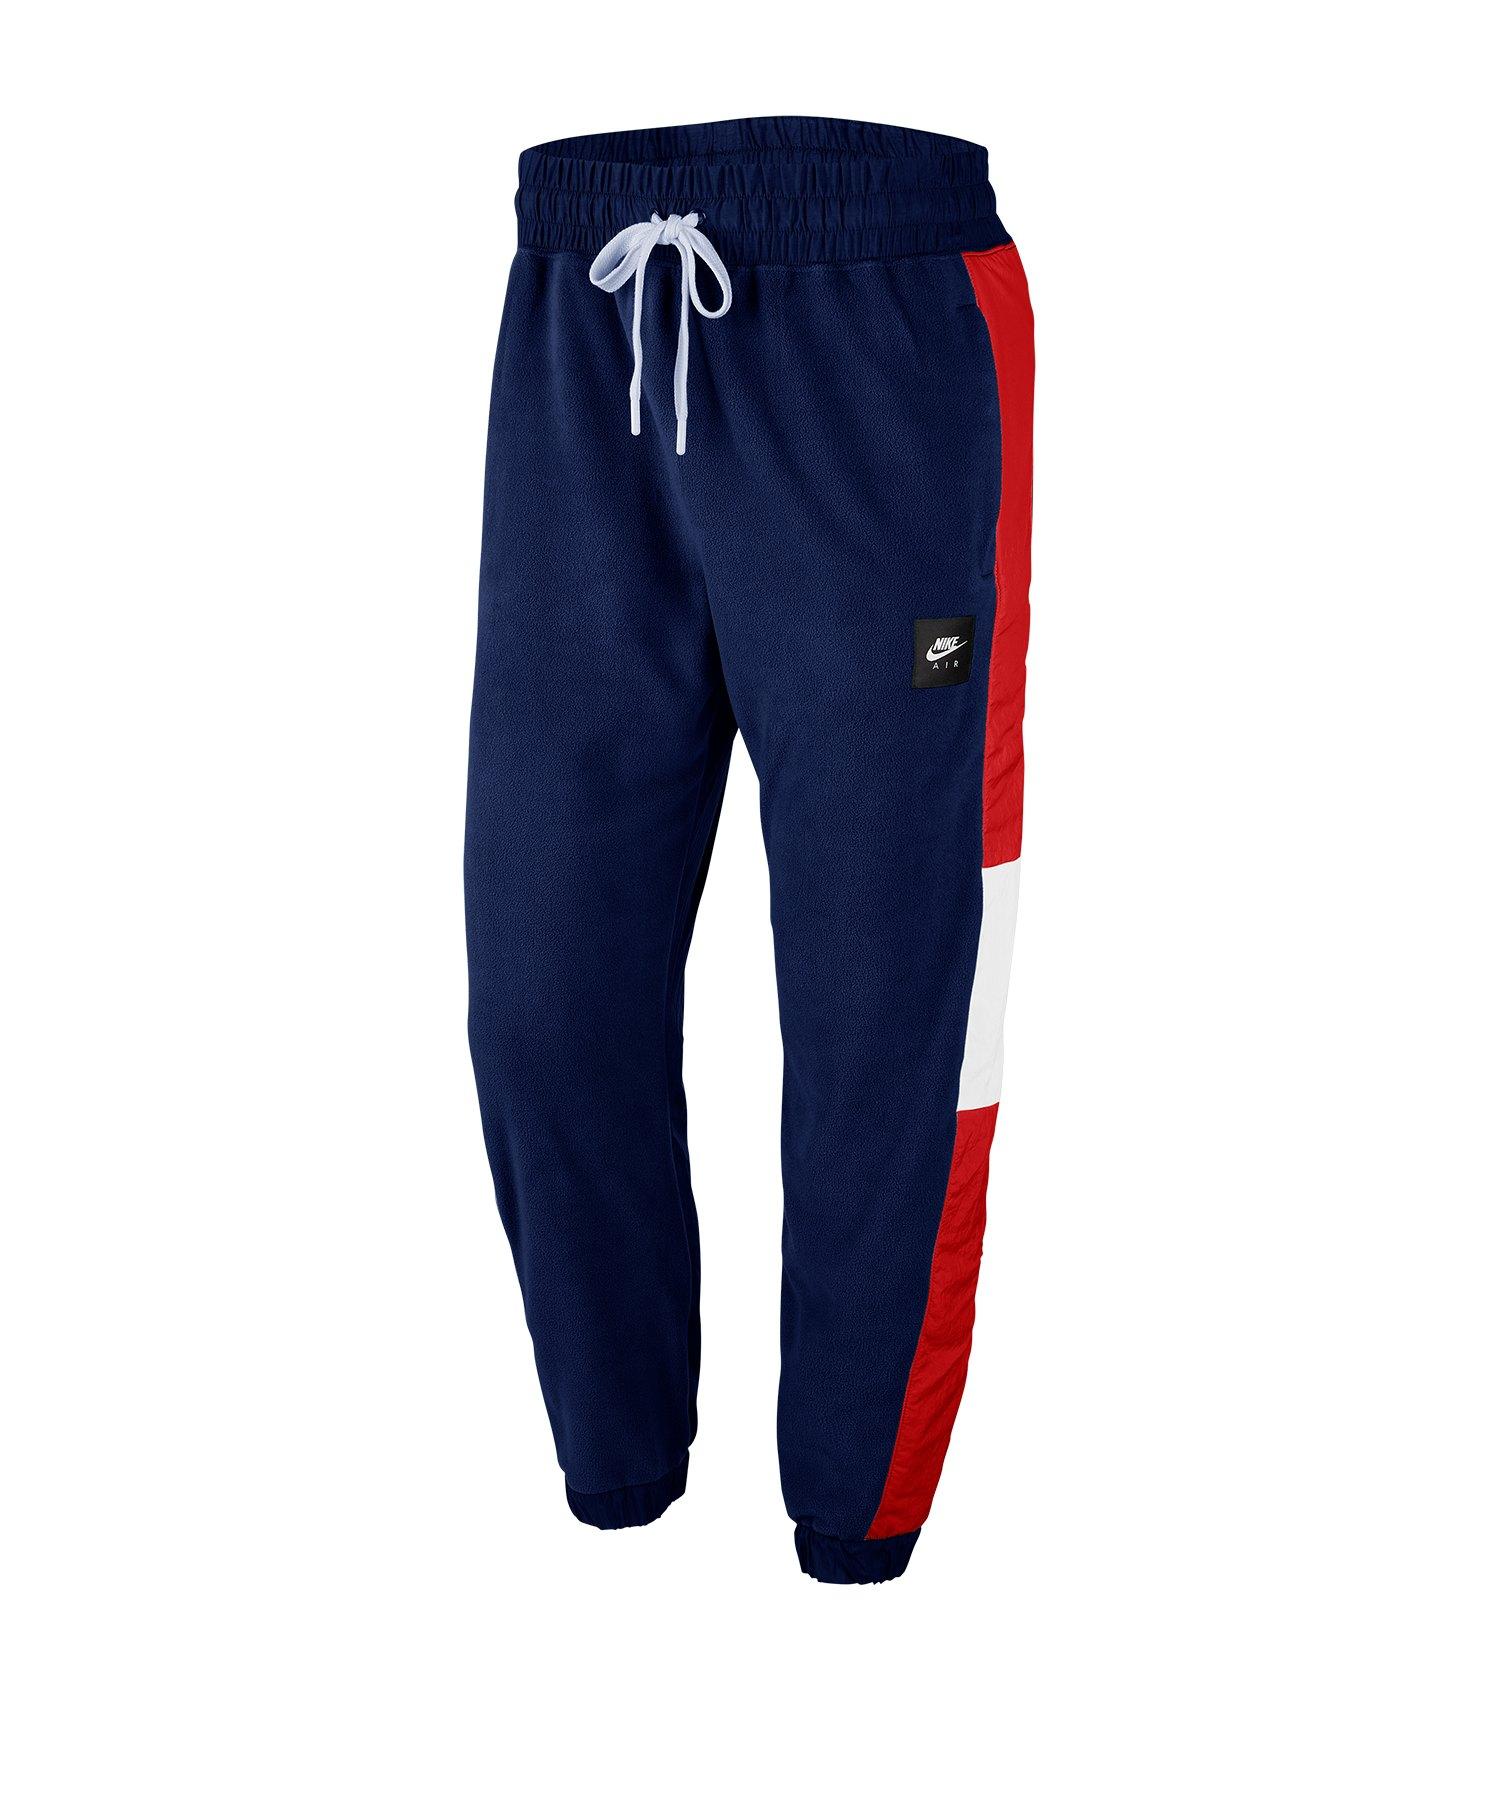 Nike Air Pants Trainingshose Blau Rot F492 - blau